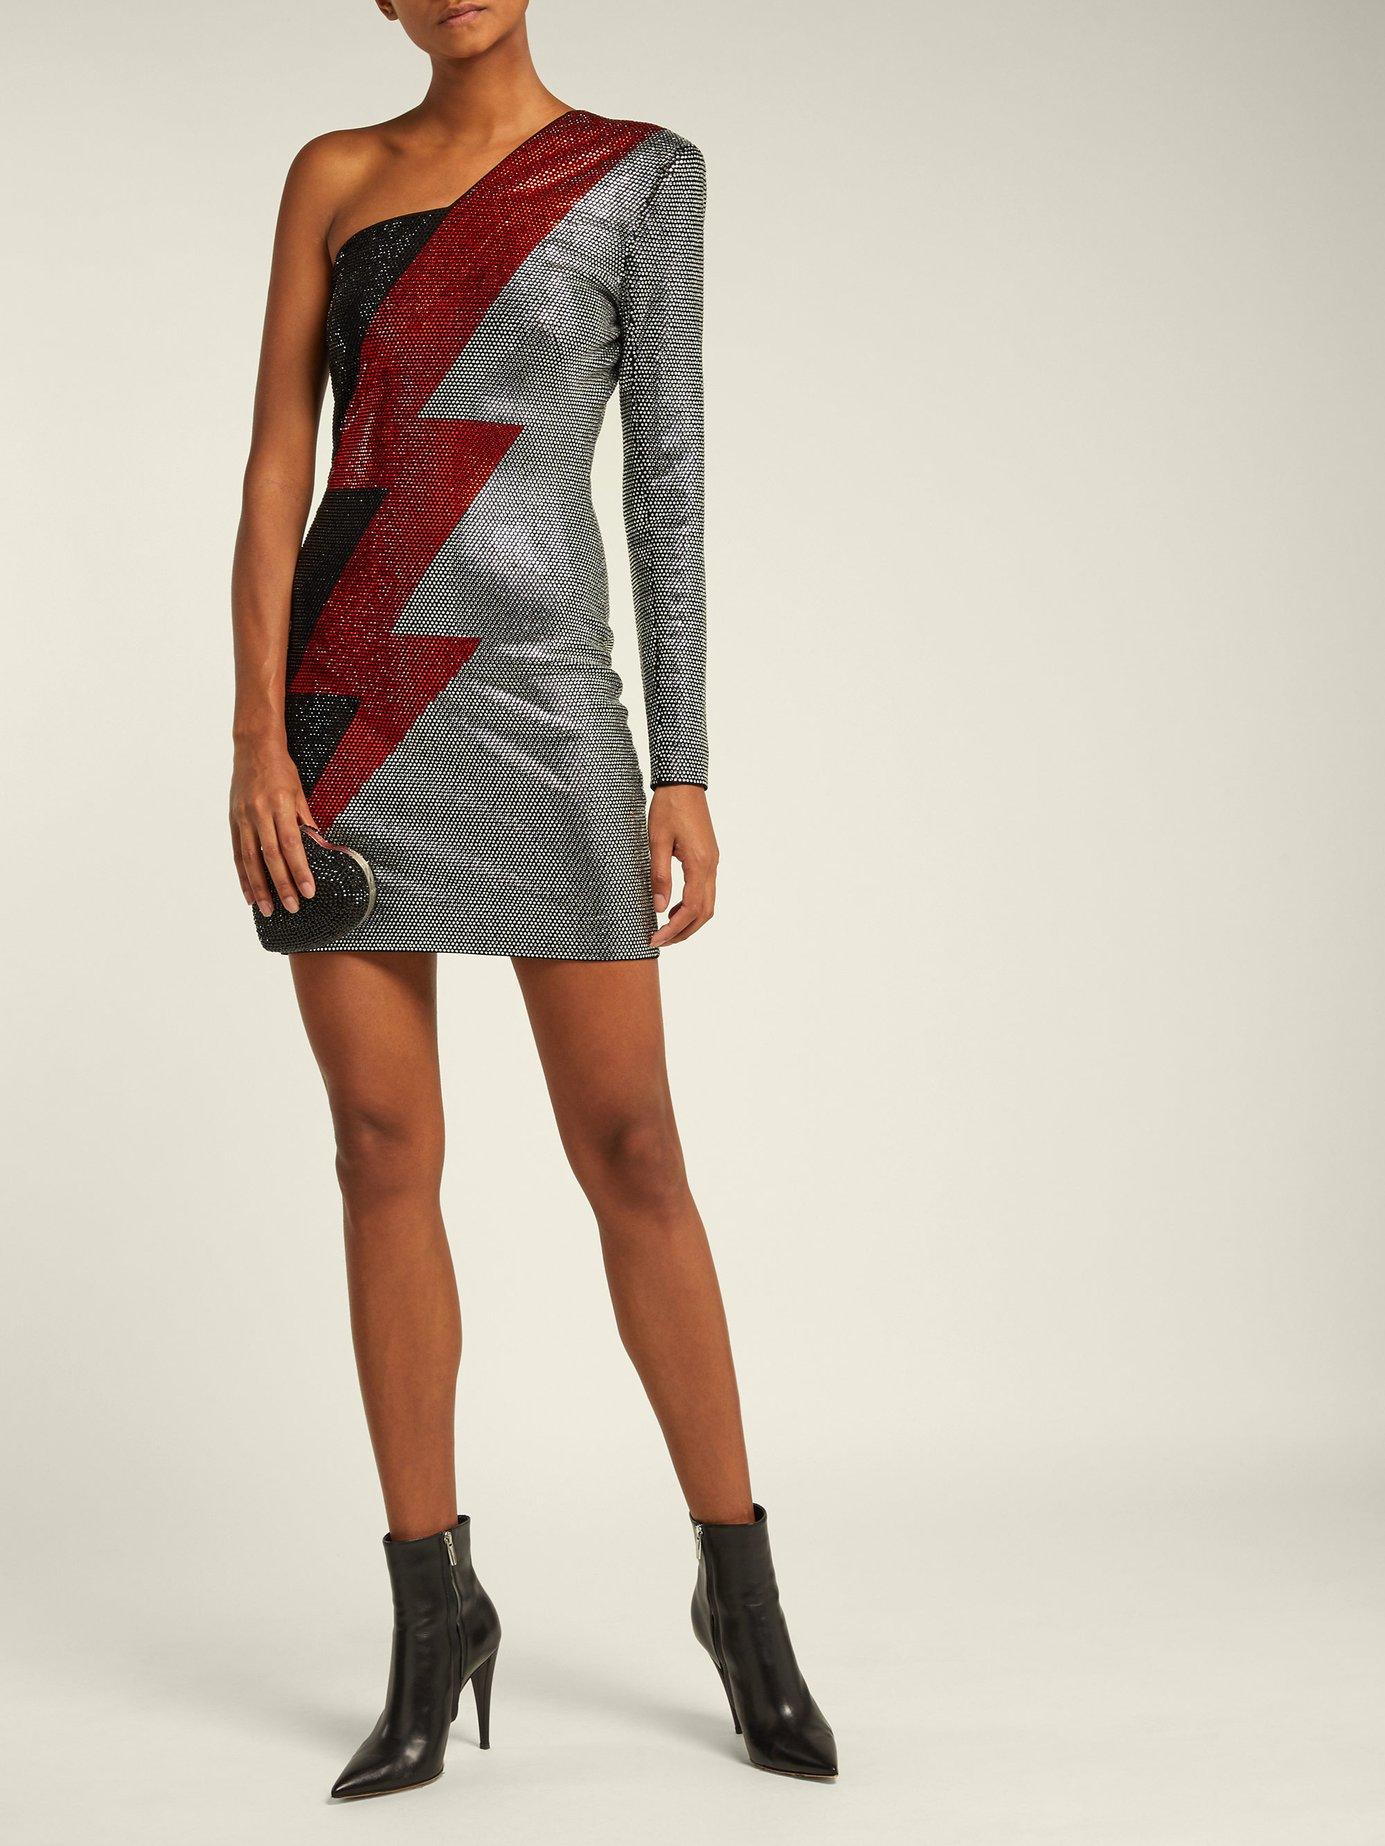 One-shoulder lightening bold-print mini dress by Balmain